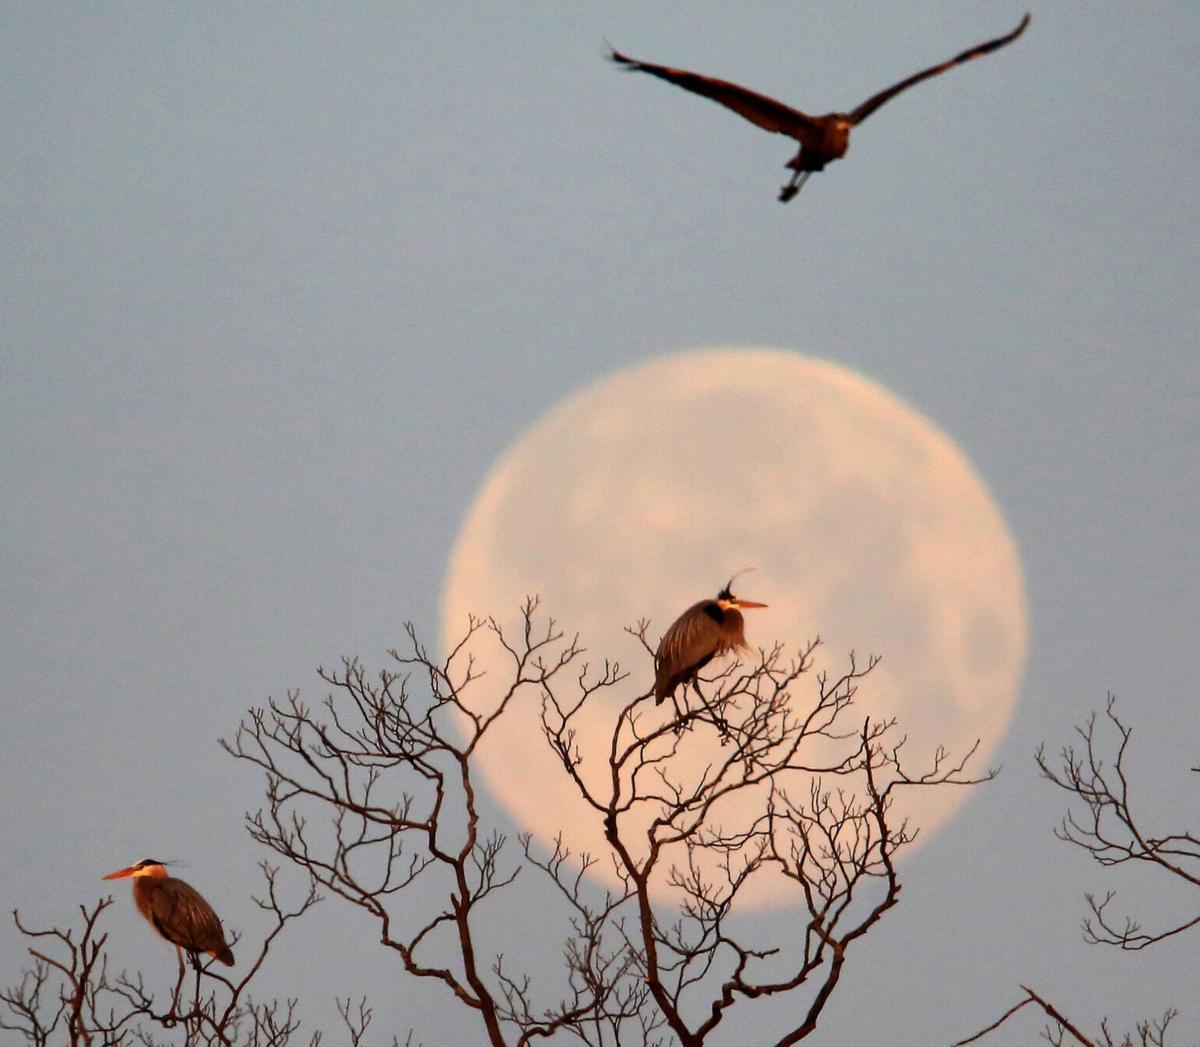 Full moon and herons